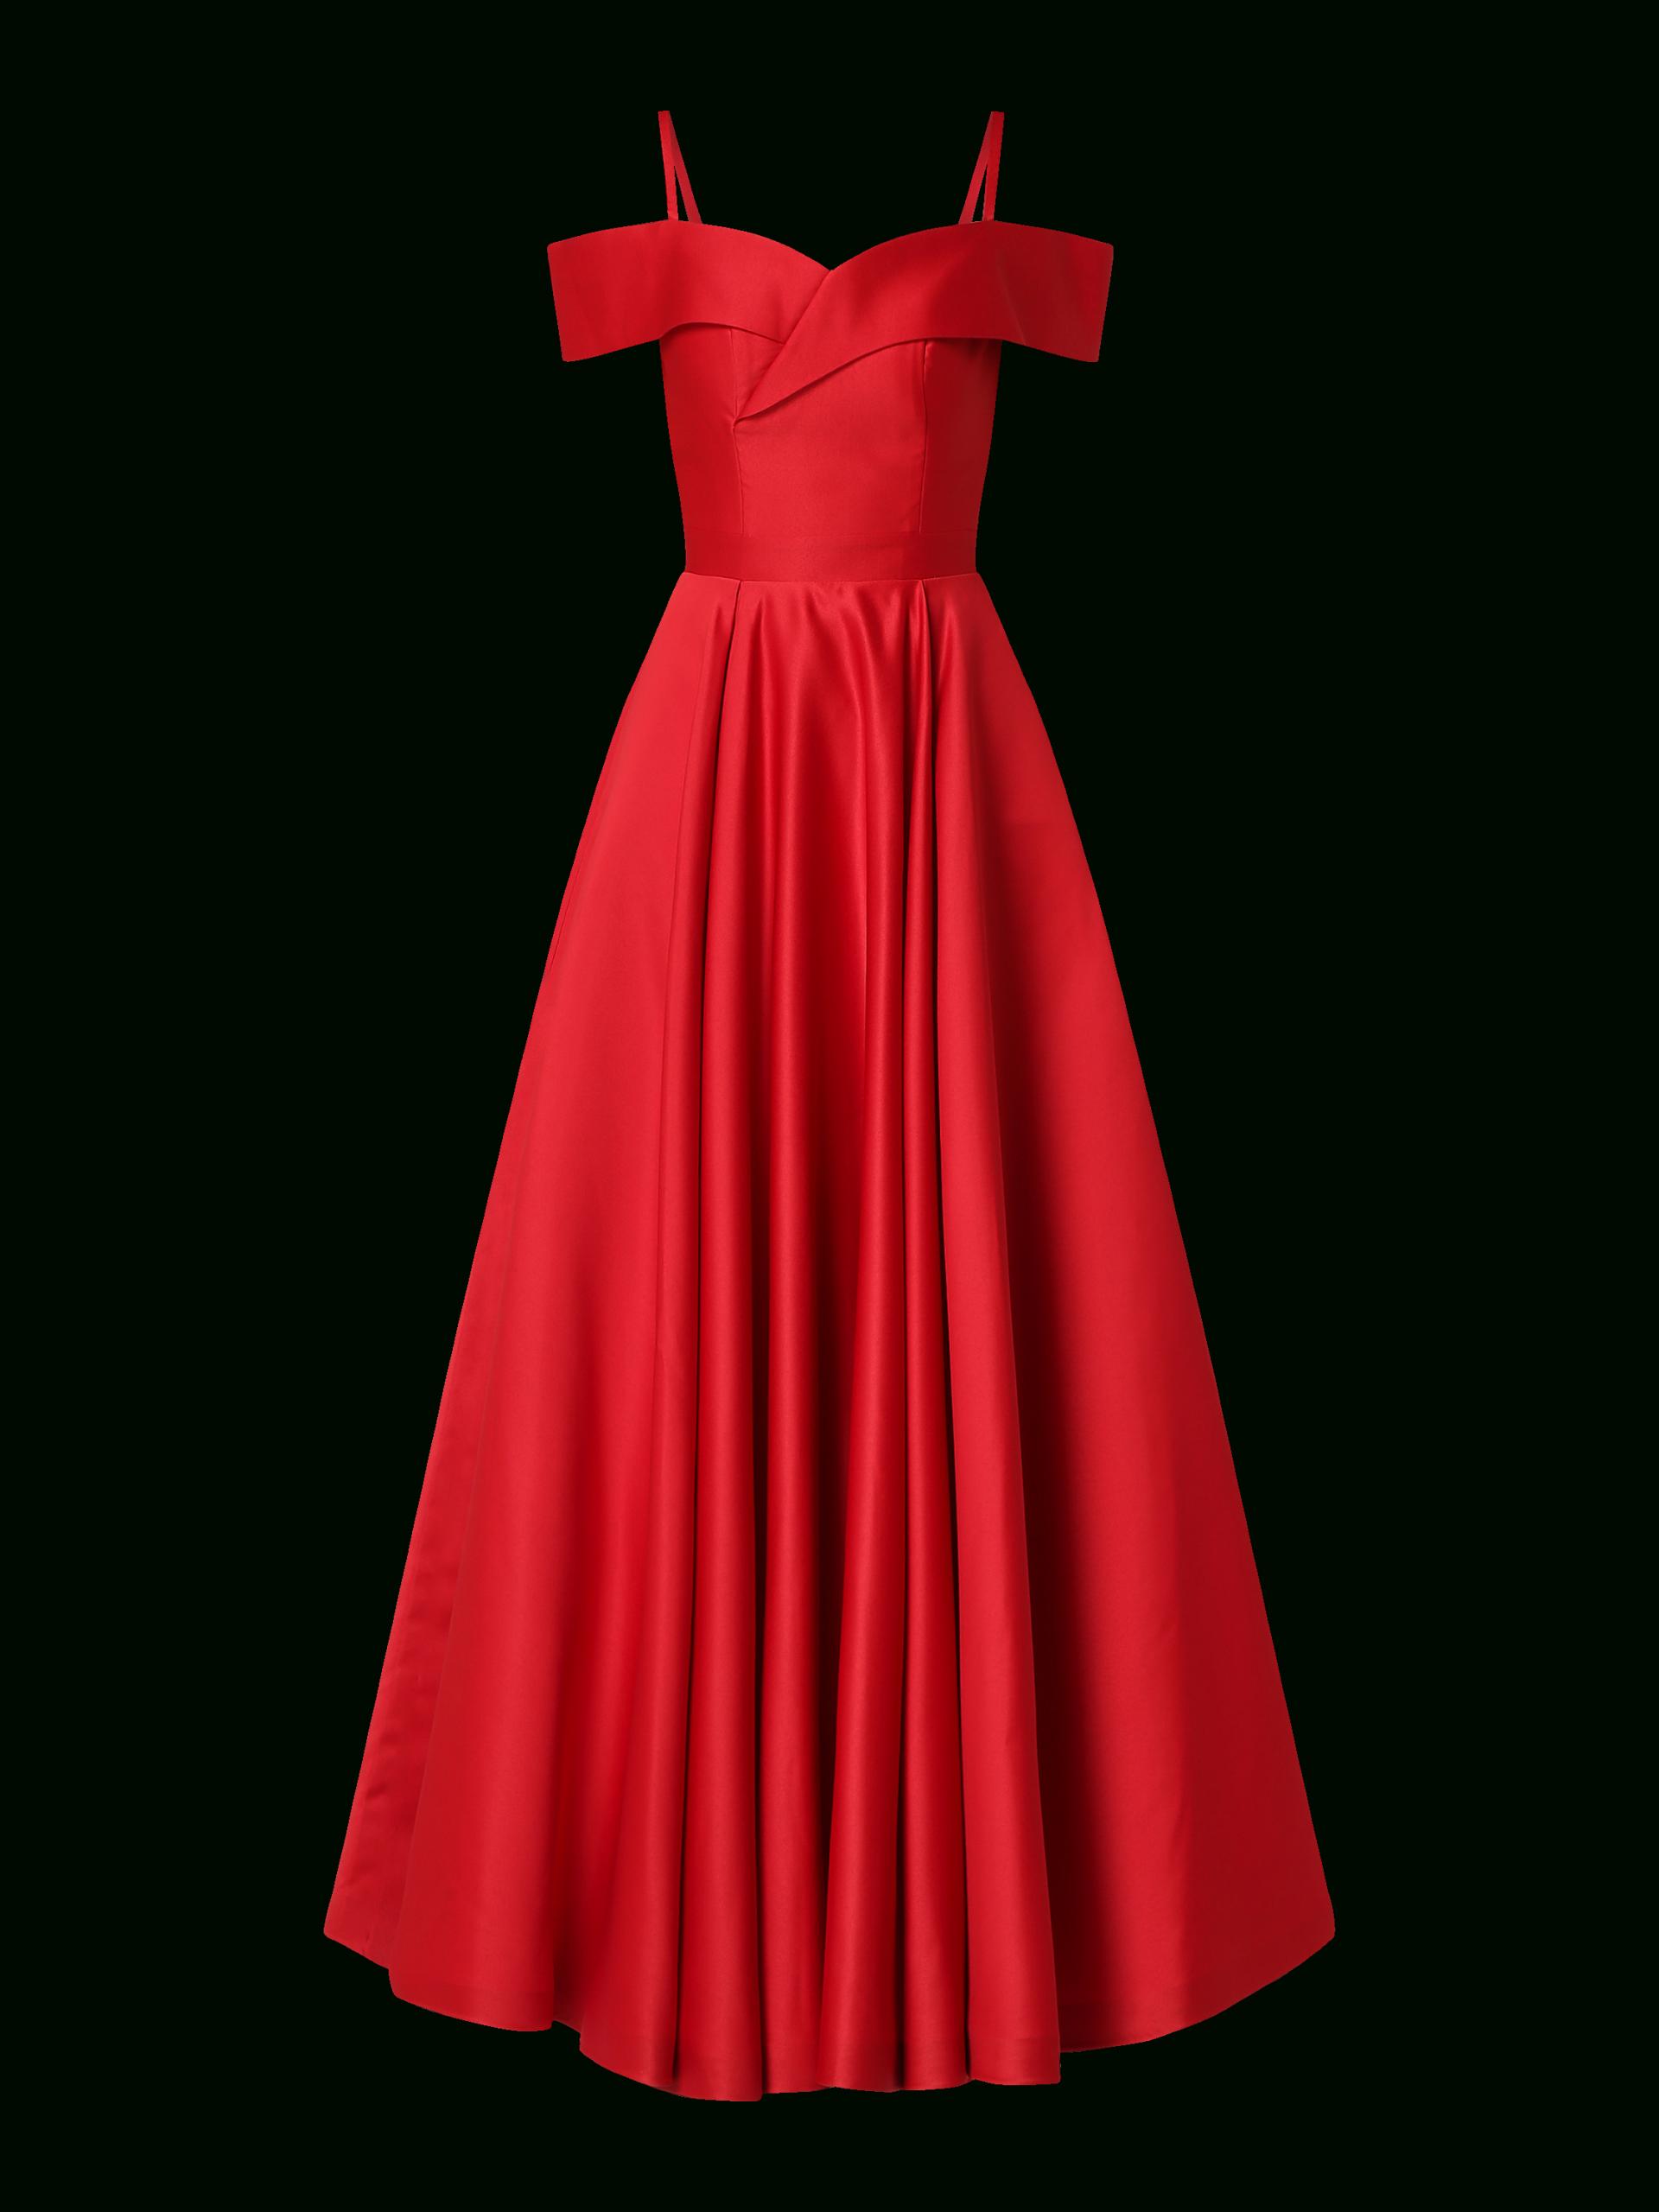 10 Coolste Troyden Collection Abendkleid Stylish20 Genial Troyden Collection Abendkleid Bester Preis